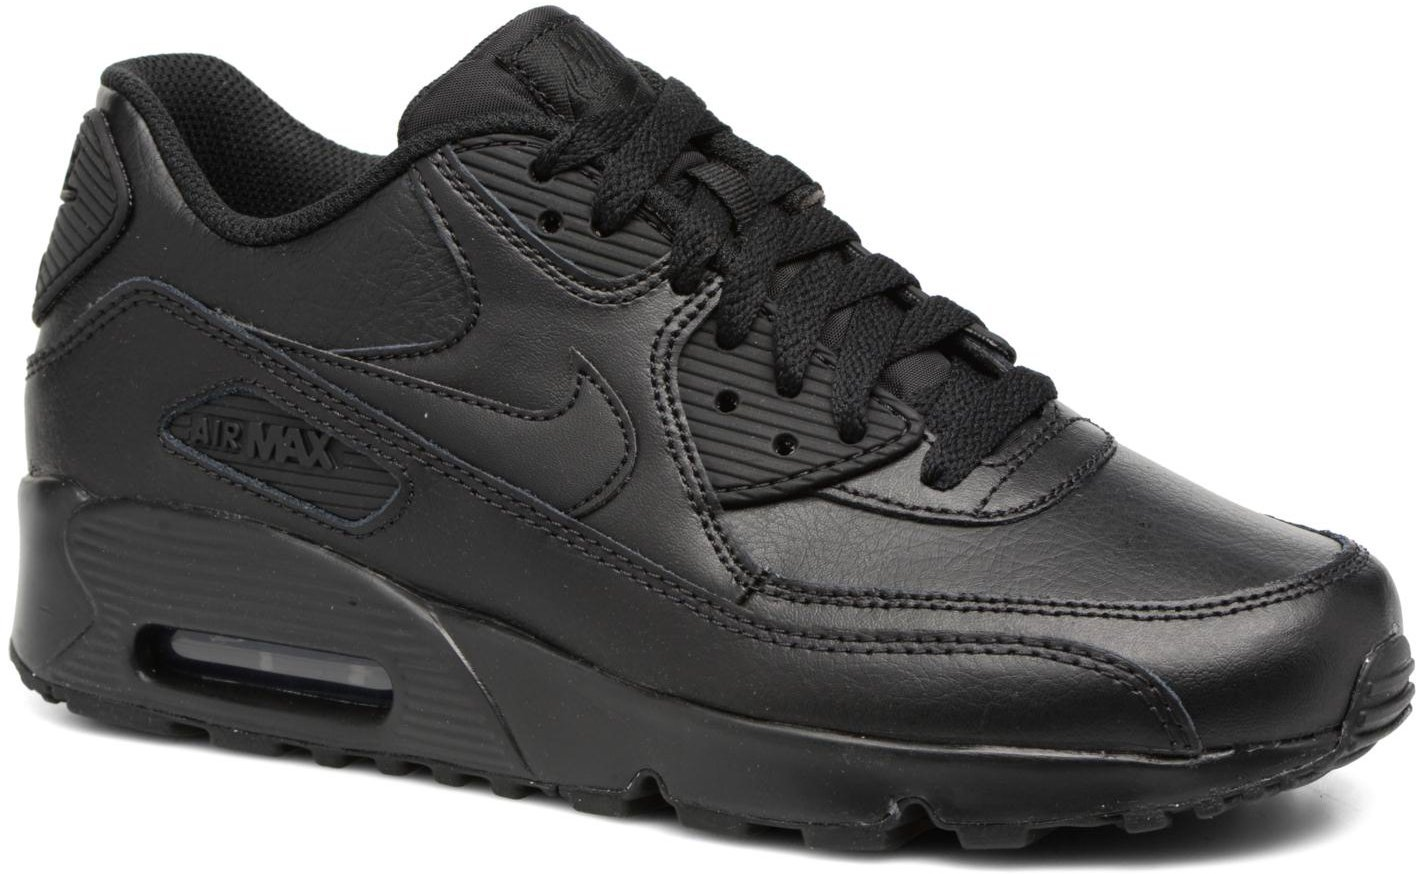 Nike Air Max 90 Leather GS blackblack